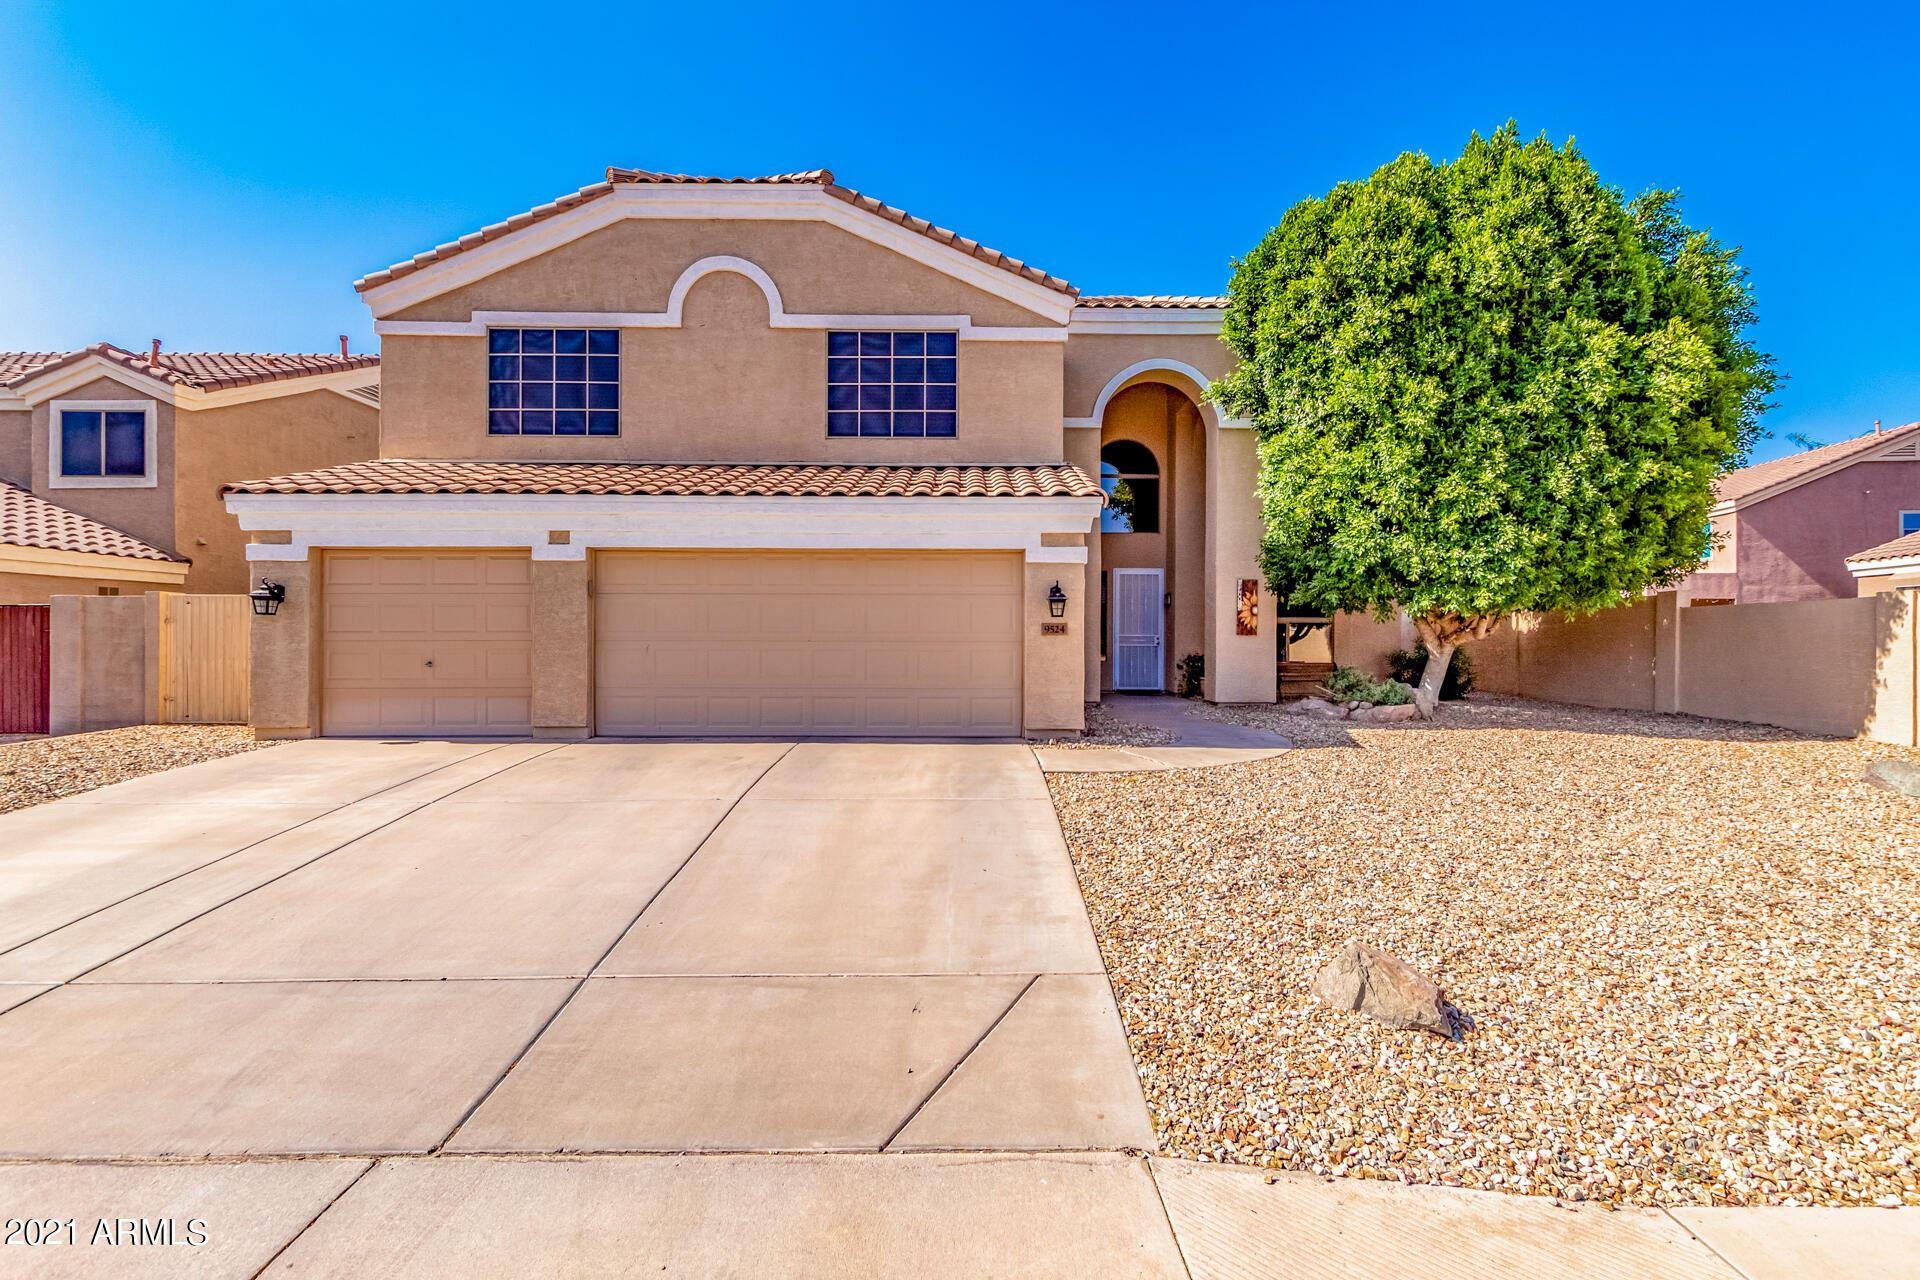 9524 E LOMPOC Avenue, Mesa, AZ 85209 - MLS#: 6234825